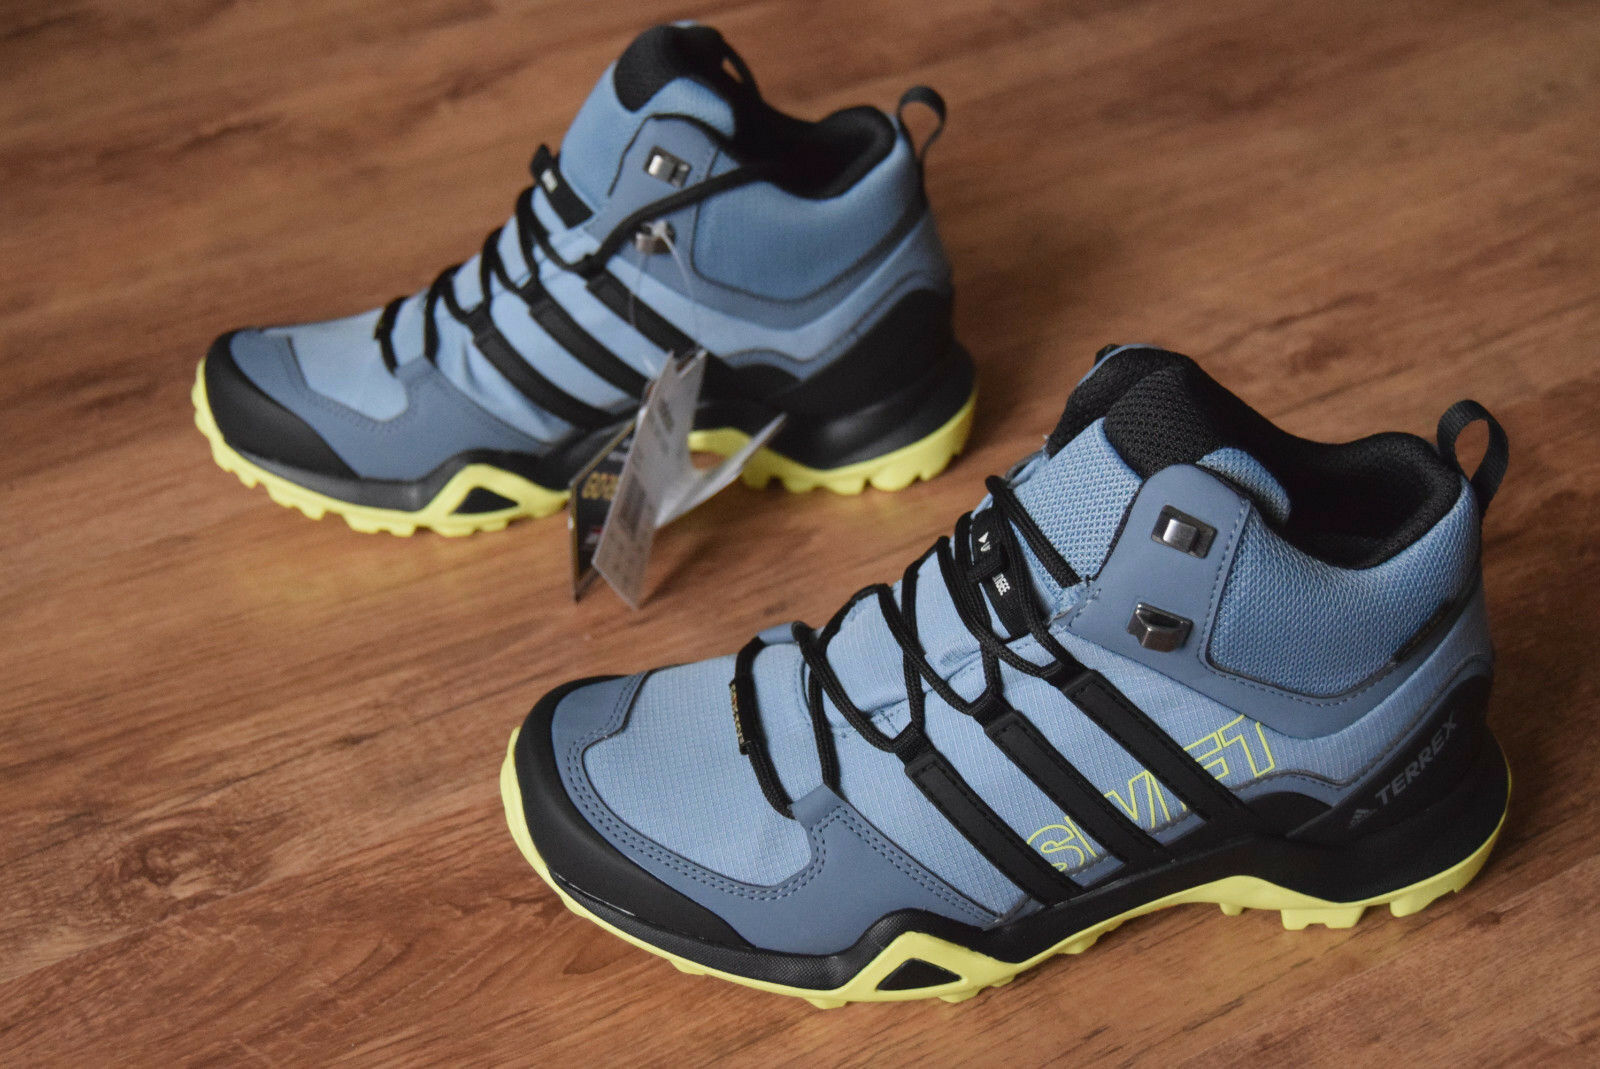 Adidas Terrex Swift R2 MID GTX W 38 5 40 40 5 42 Wanderschuhe CM7652